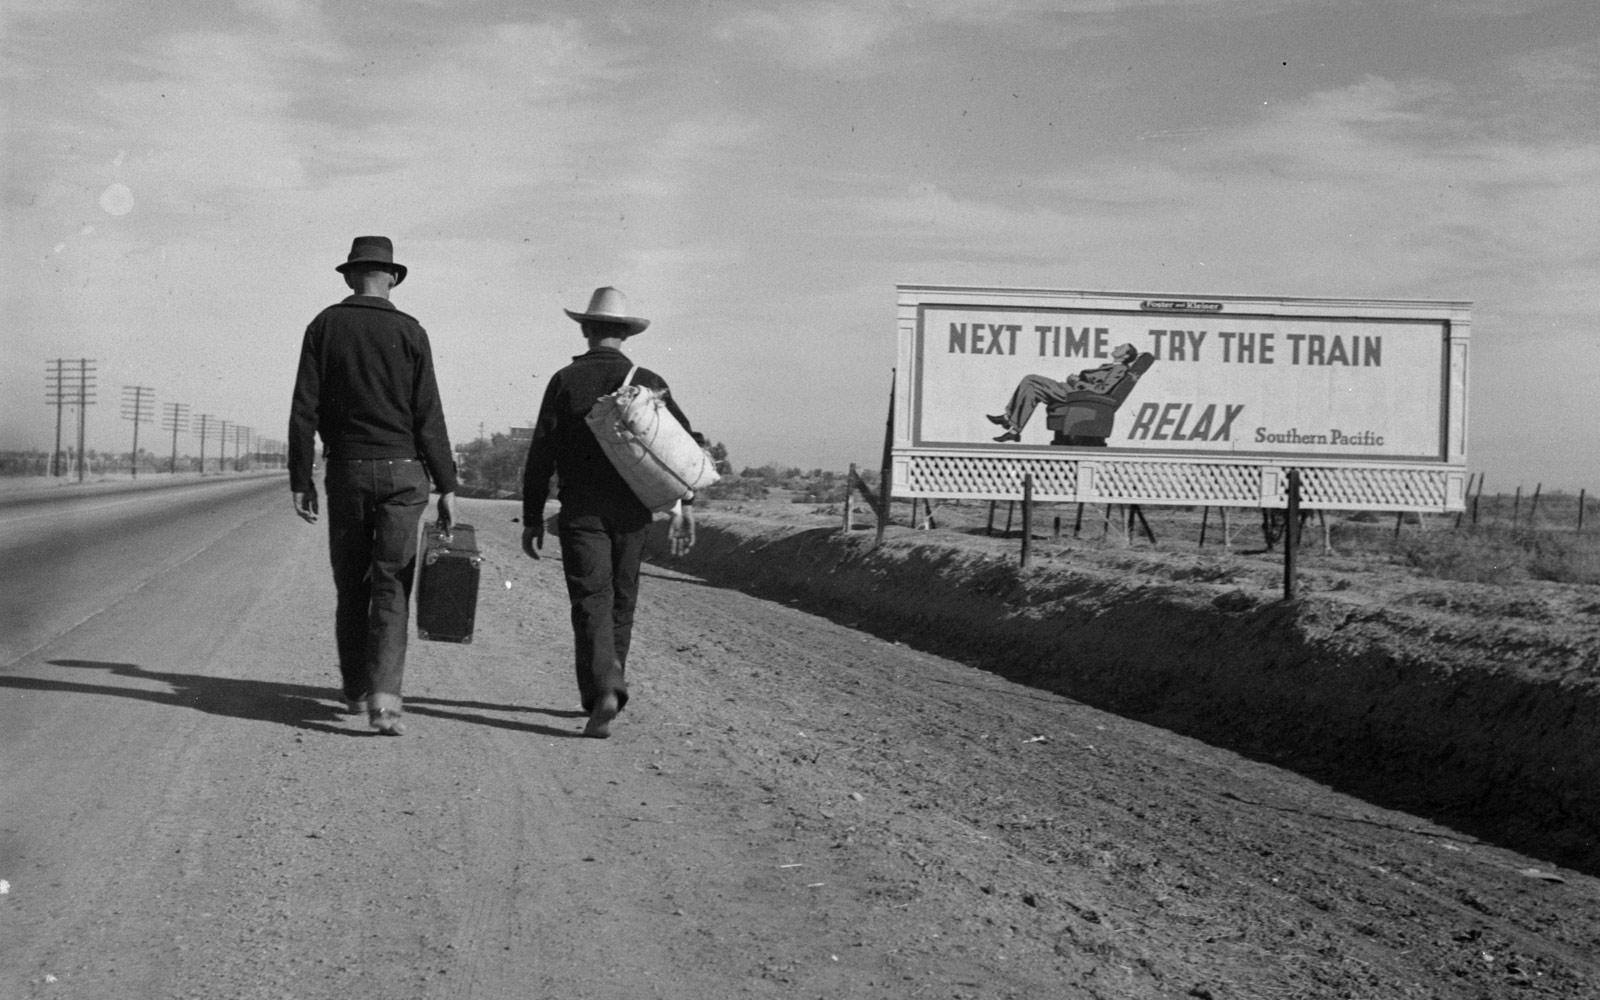 Dos homes caminant cap a Los Angeles, 1937